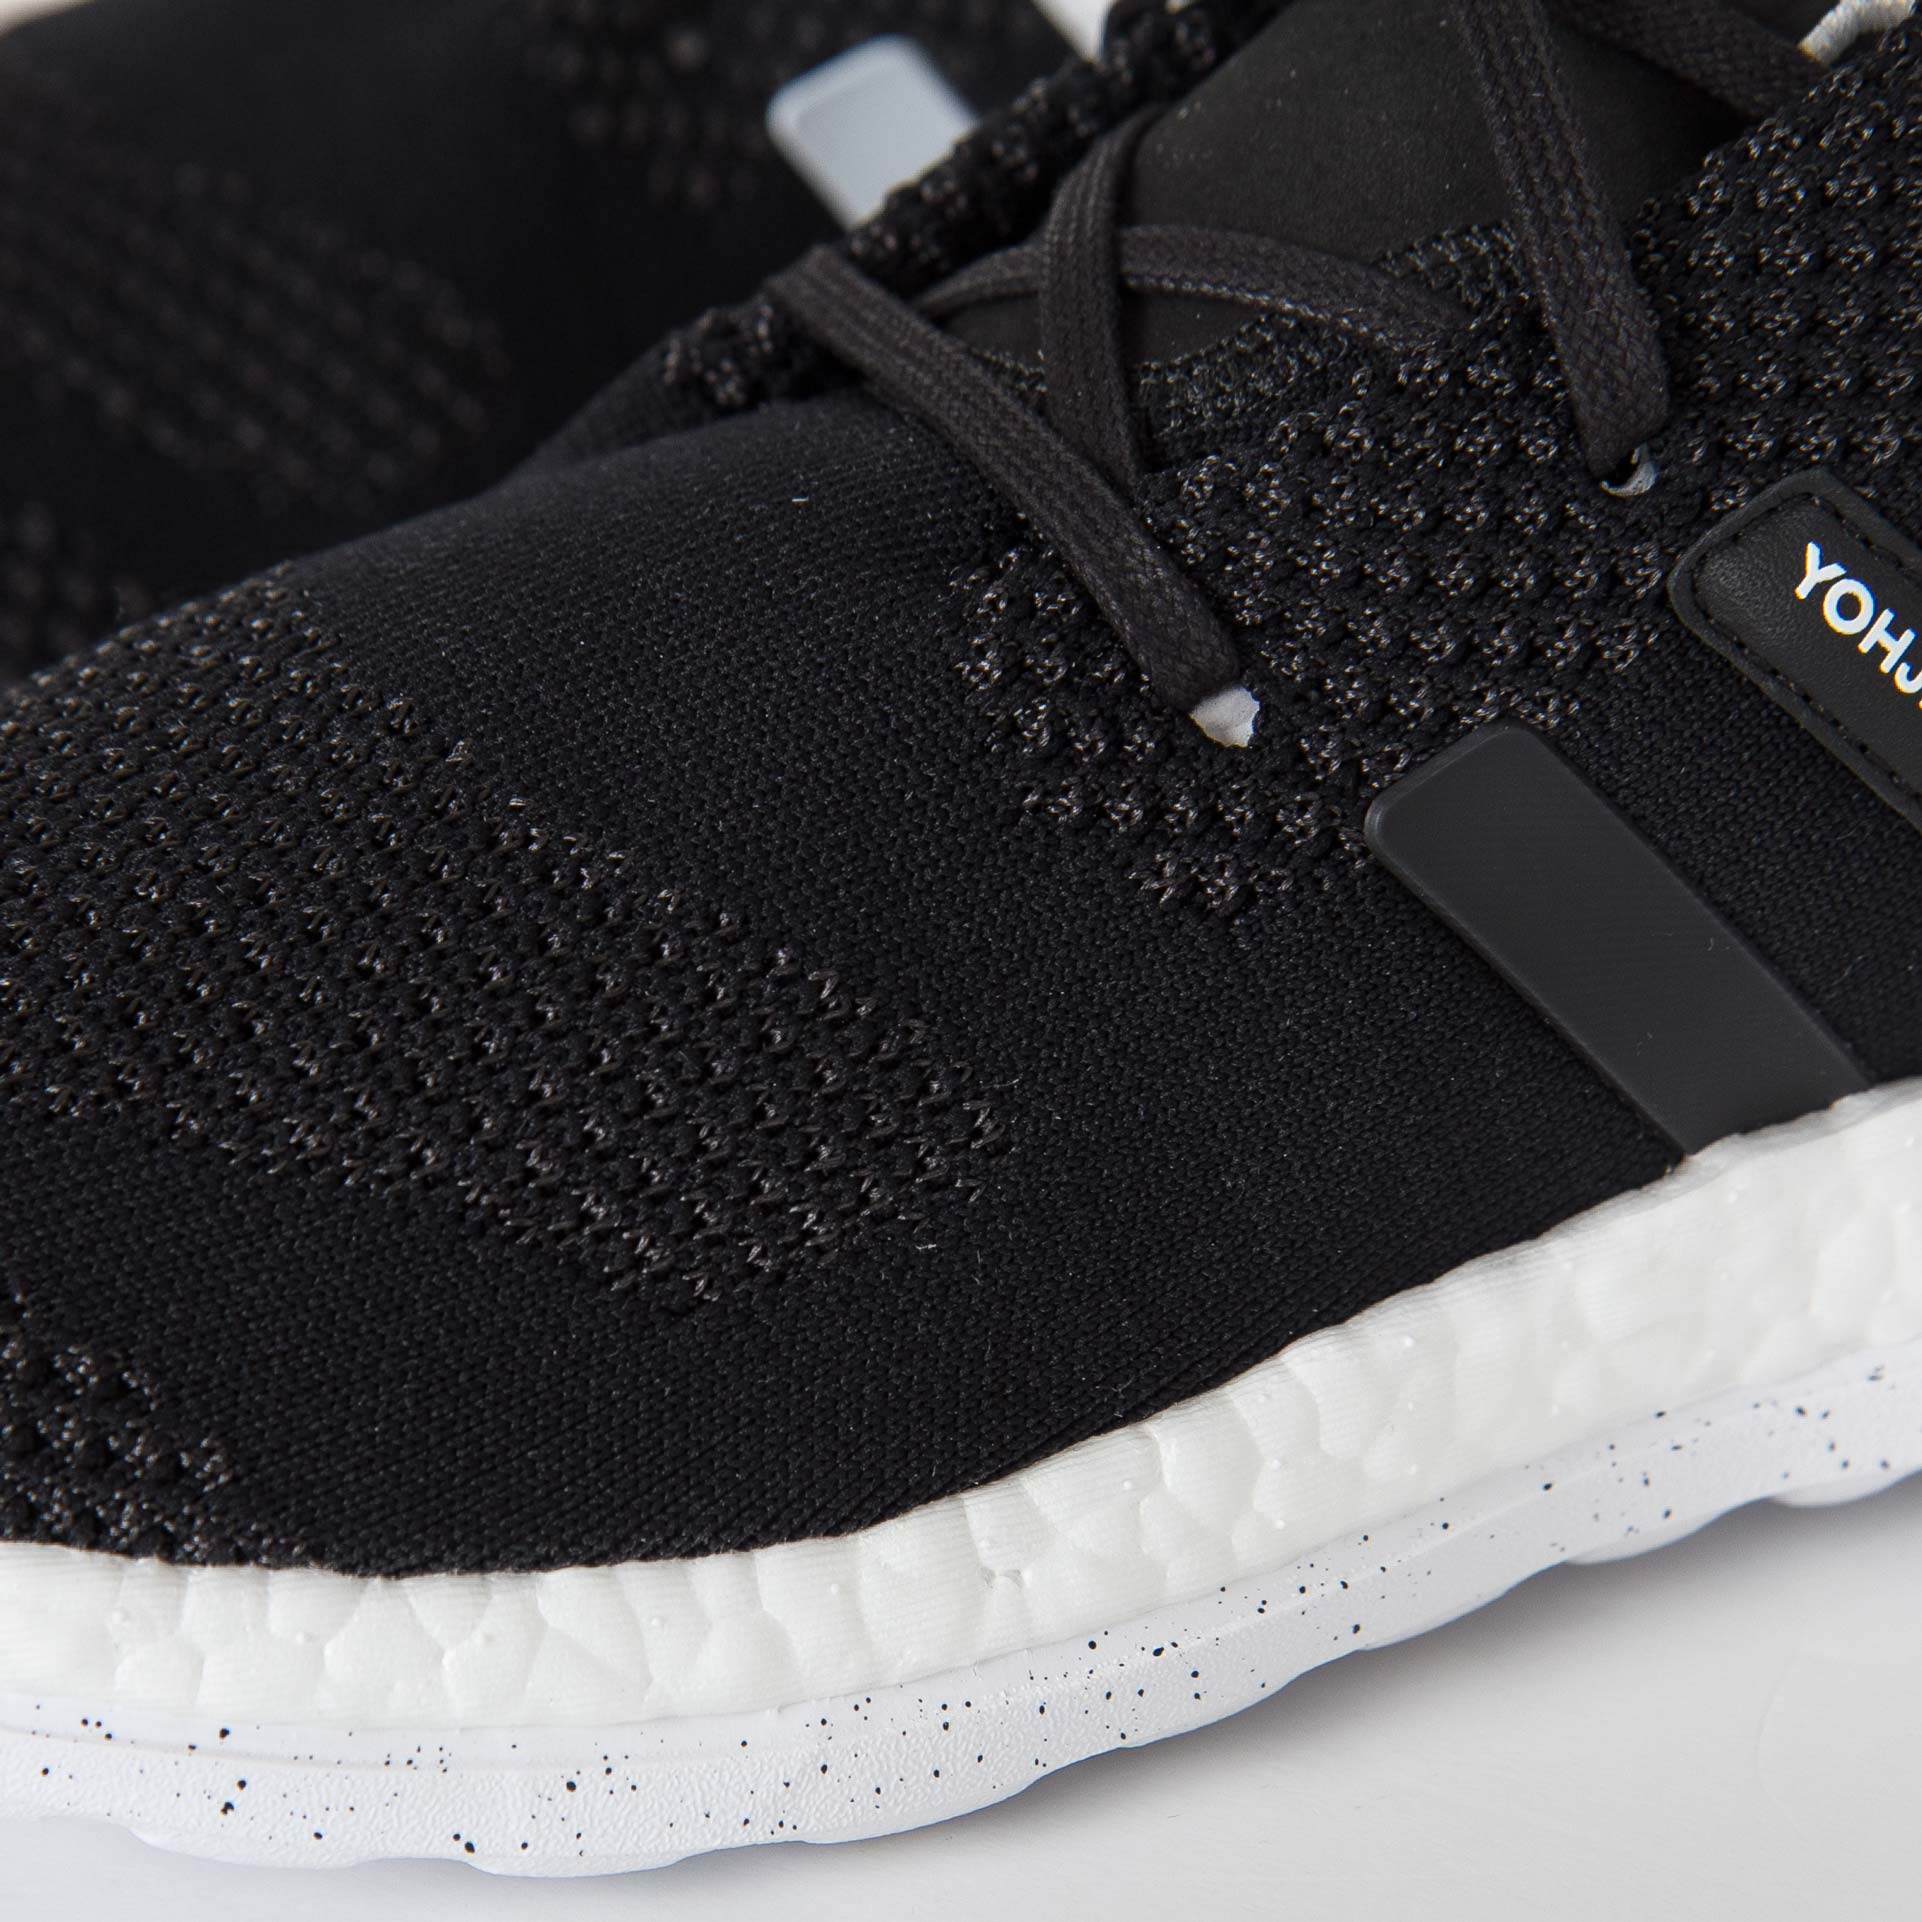 79edf0d19c7 adidas Y-3 Pure Boost ZG Knit - Aq5729 - Sneakersnstuff